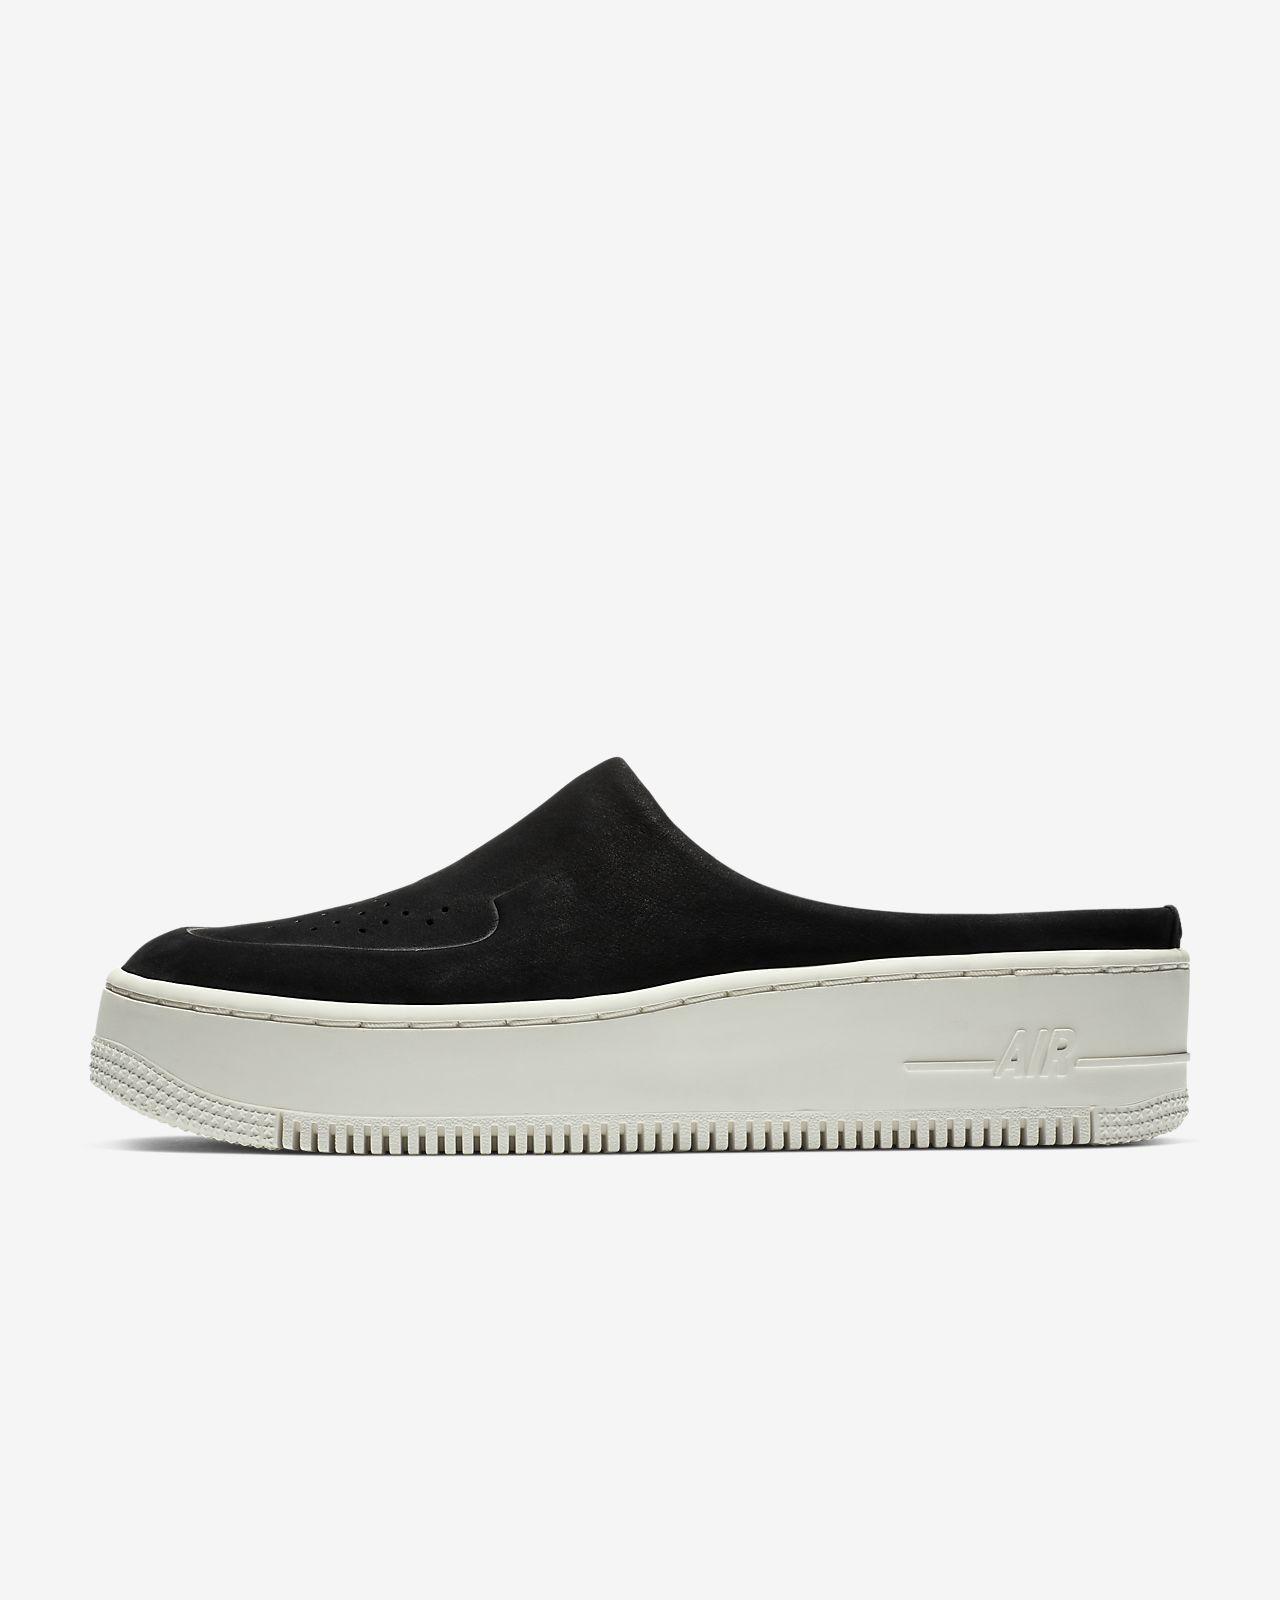 san francisco 6010c b0a8f Nike Air Force 1 Lover XX Premium-sko til kvinder